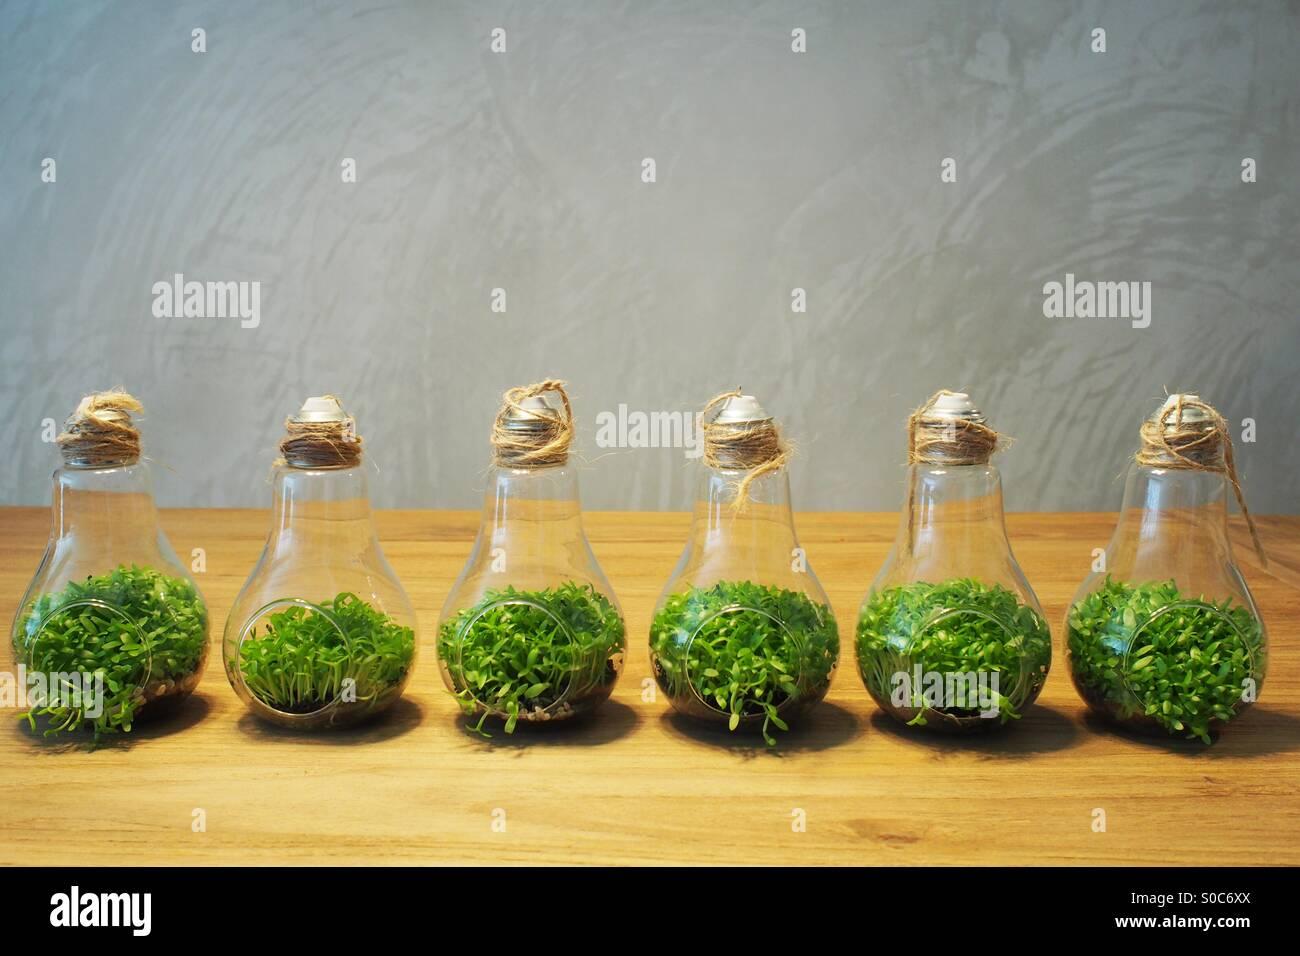 Zwiebelpflanzen. Stockbild